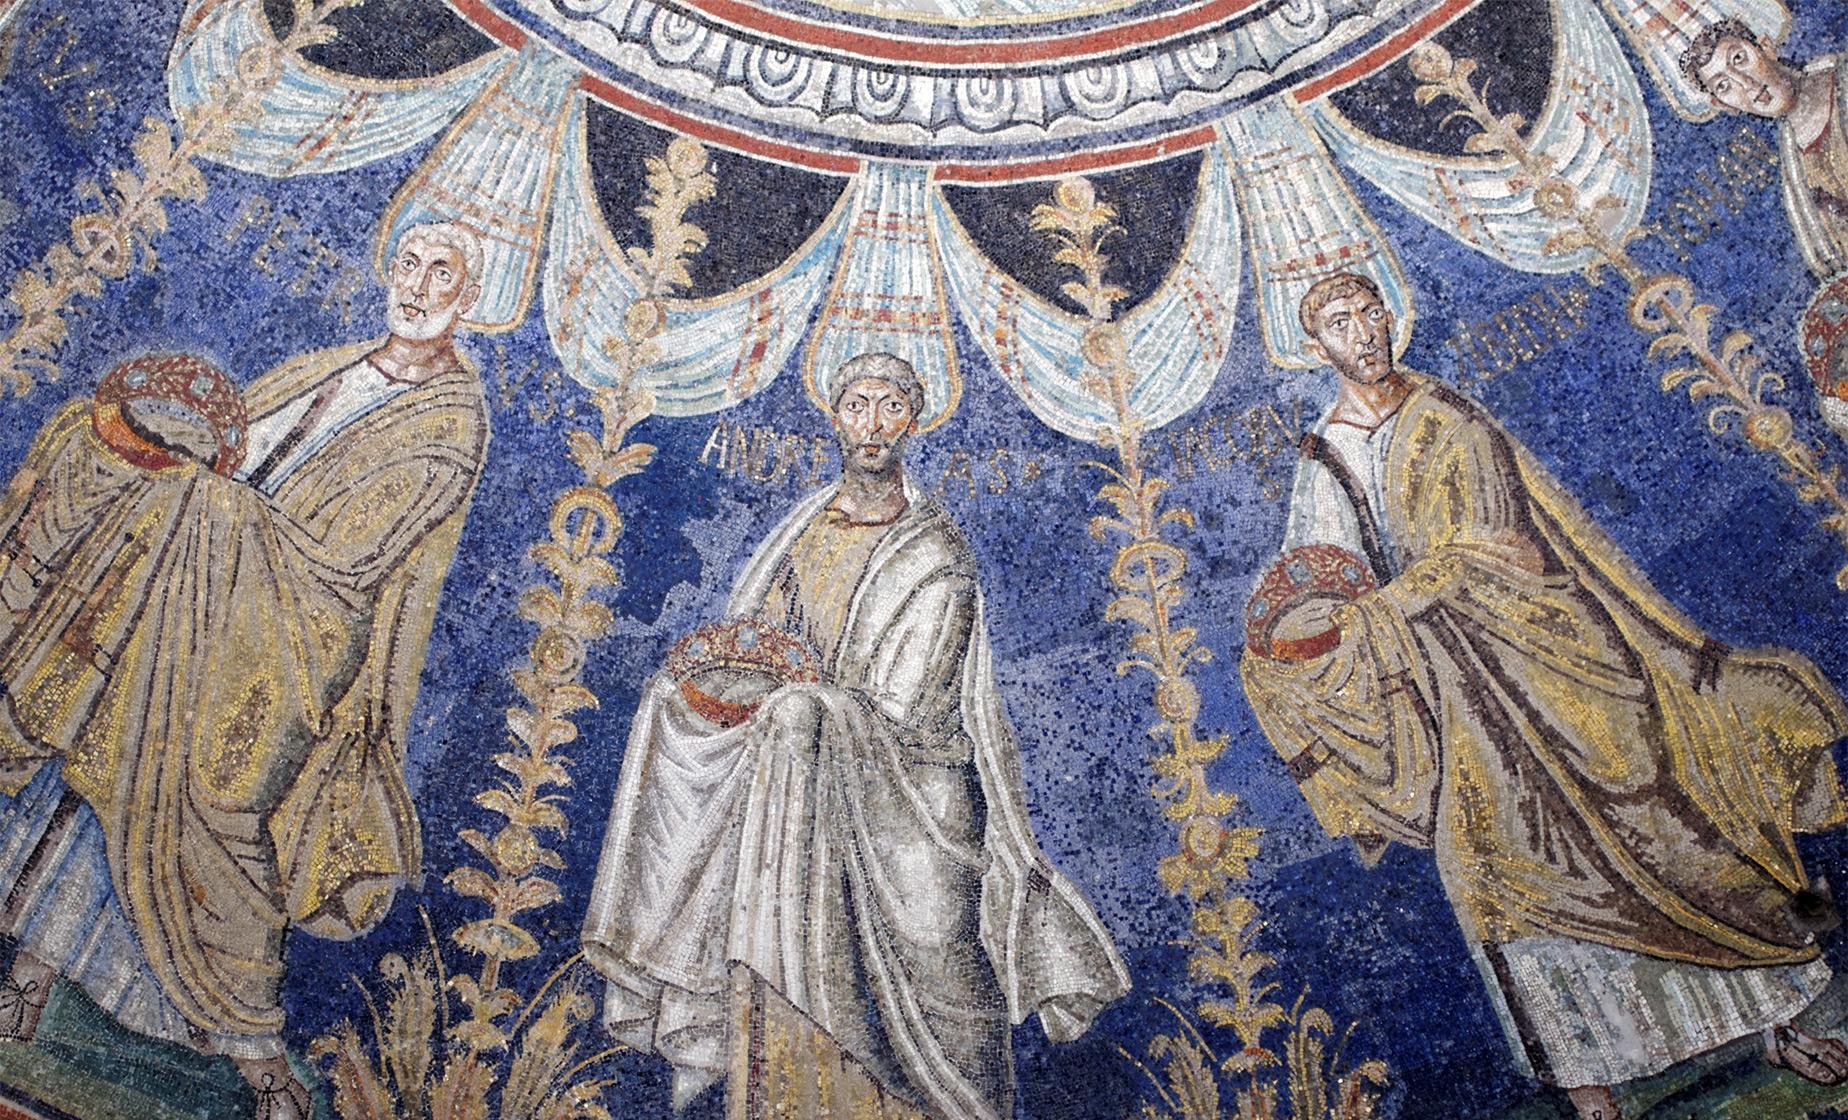 Highlights of Ravenna